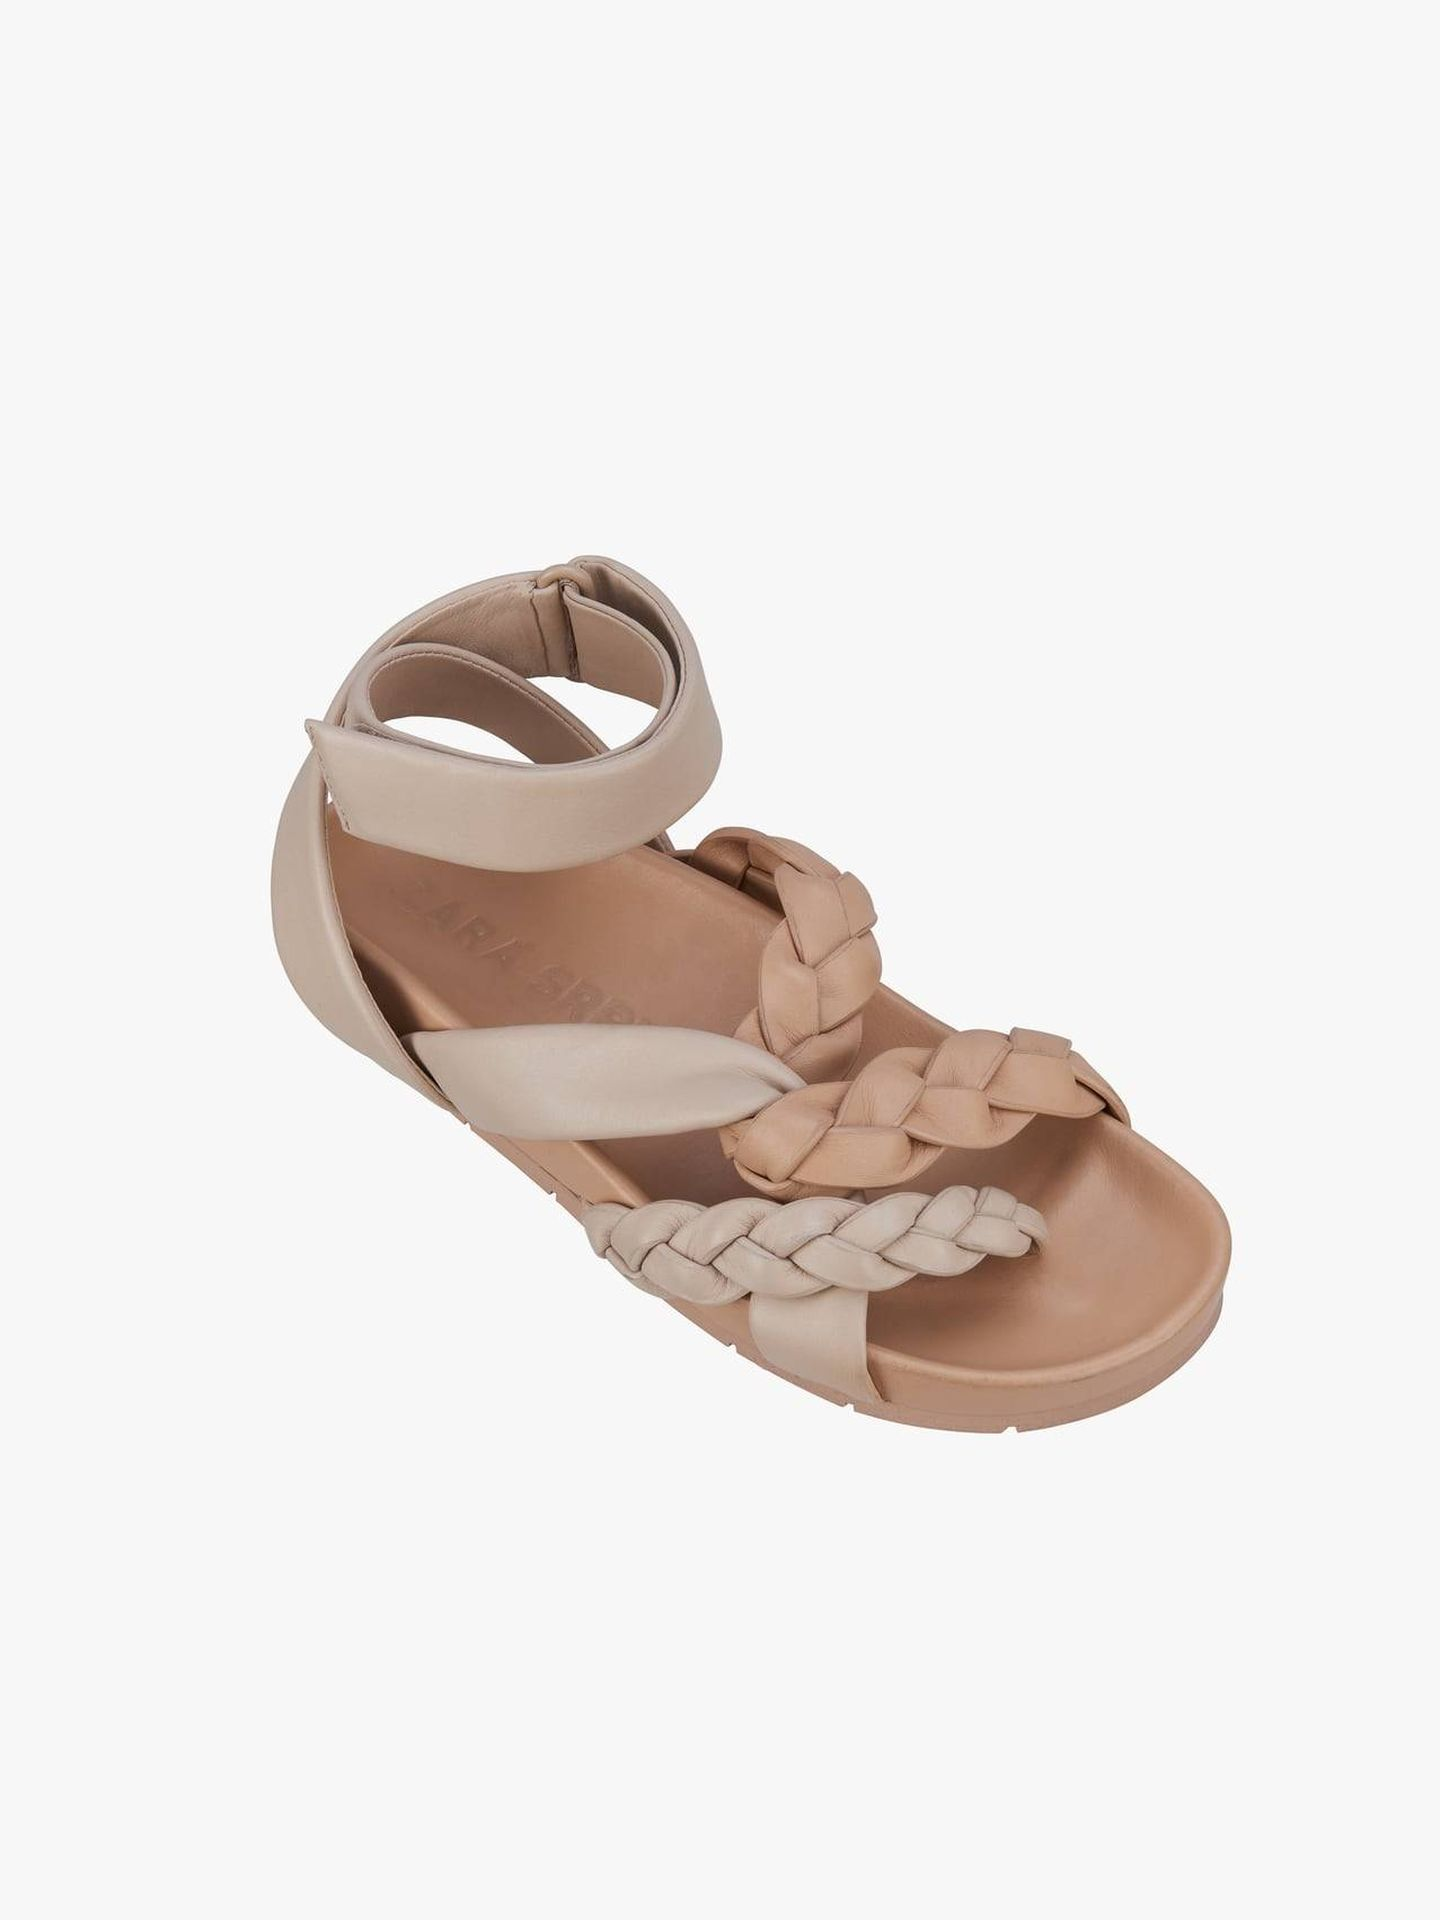 Sandalias de Zara SPLS. (Cortesía)